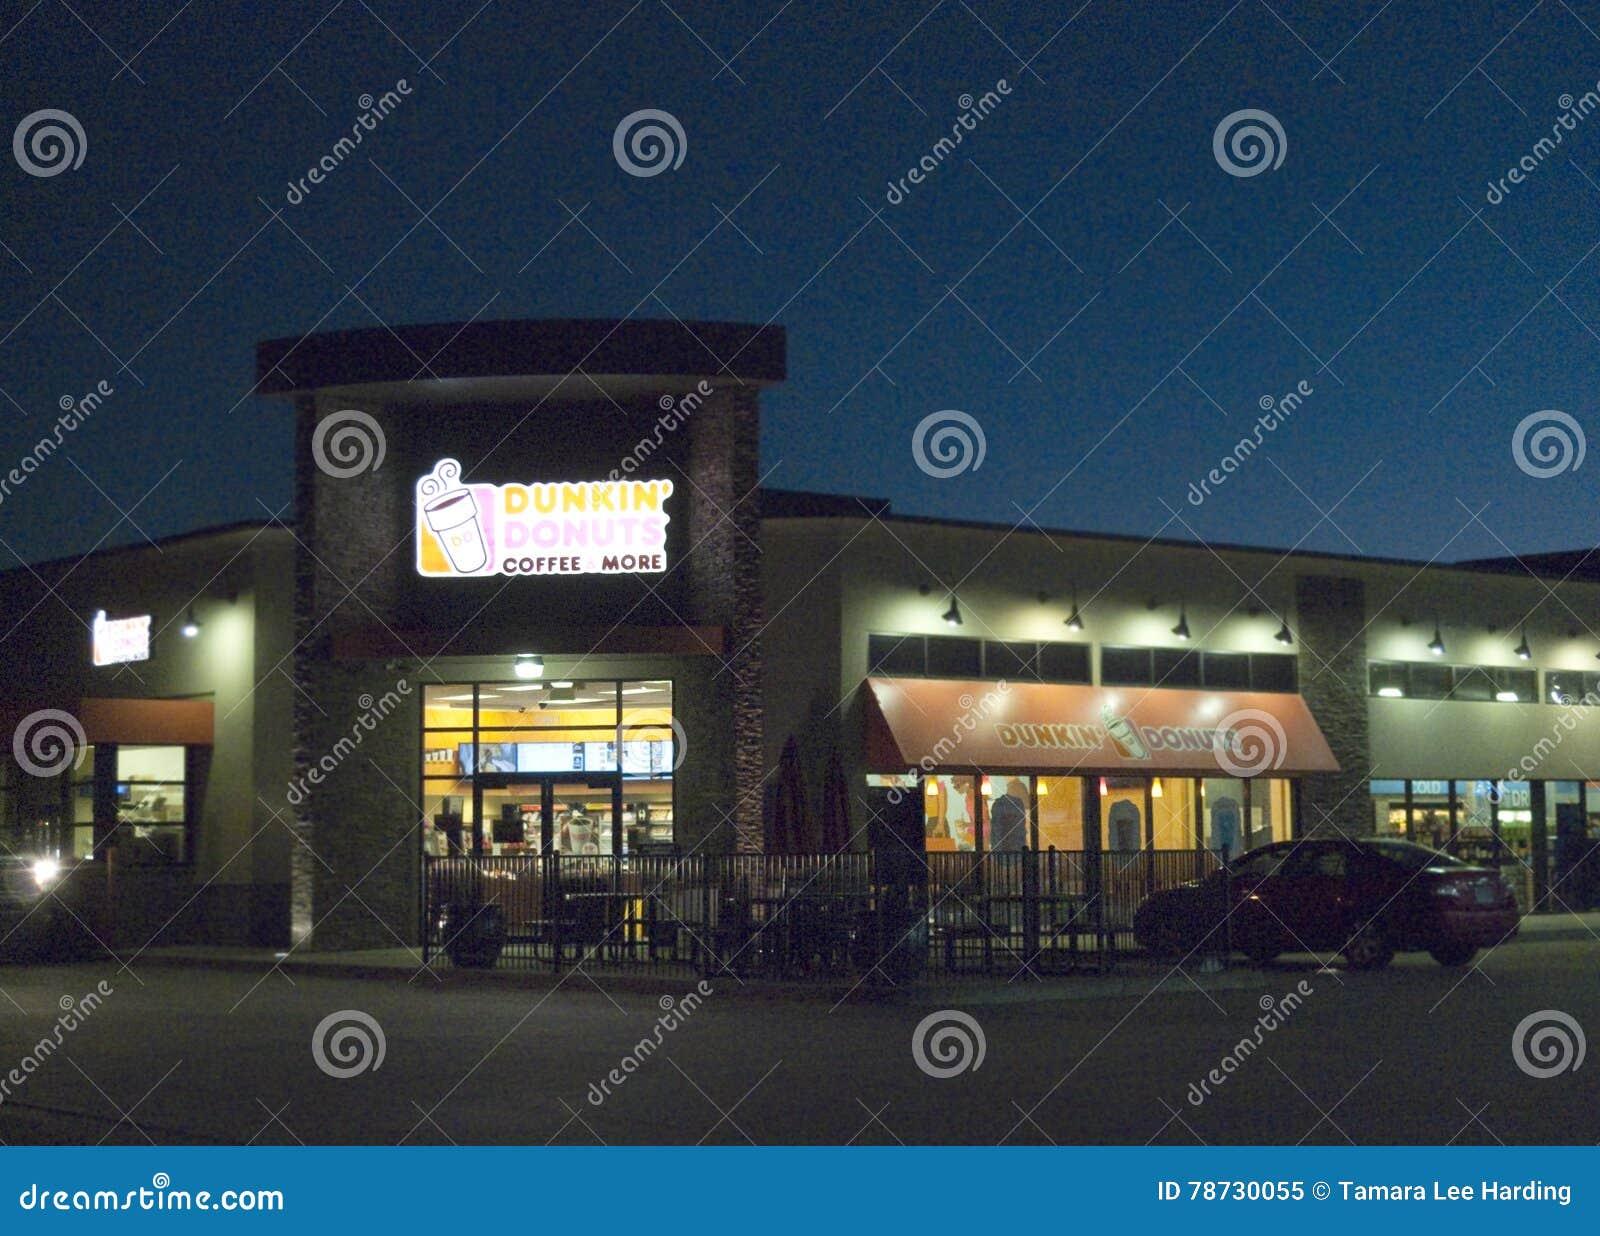 Dunkin Donuts, Fort Smith, Arkansas